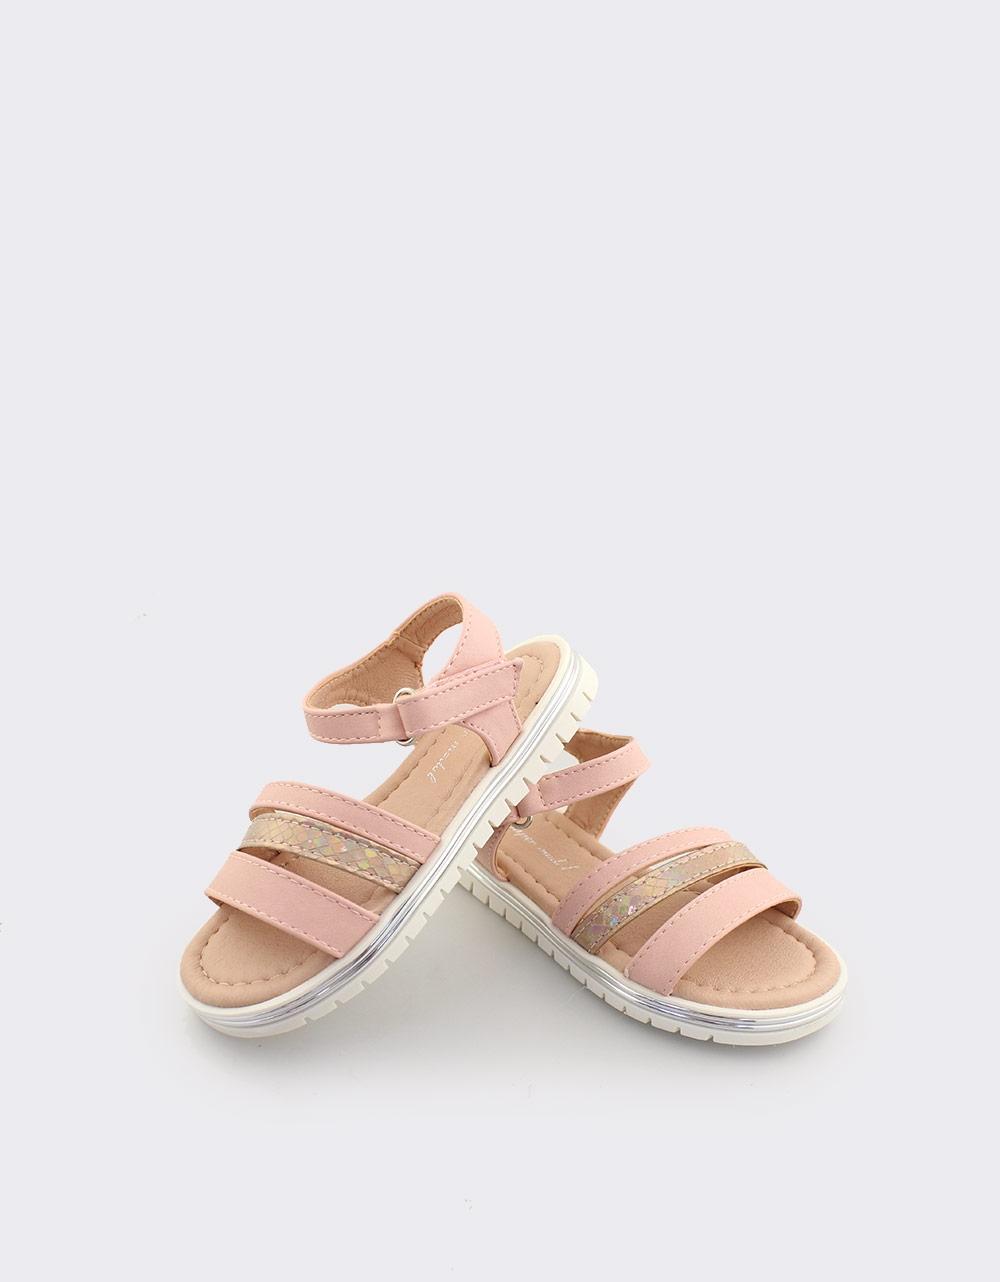 810a2b93d6b Inshoes.gr. Παιδικά πέδιλα με μεταλλιζέ λεπτομέρειες | InShoes.gr Ροζ